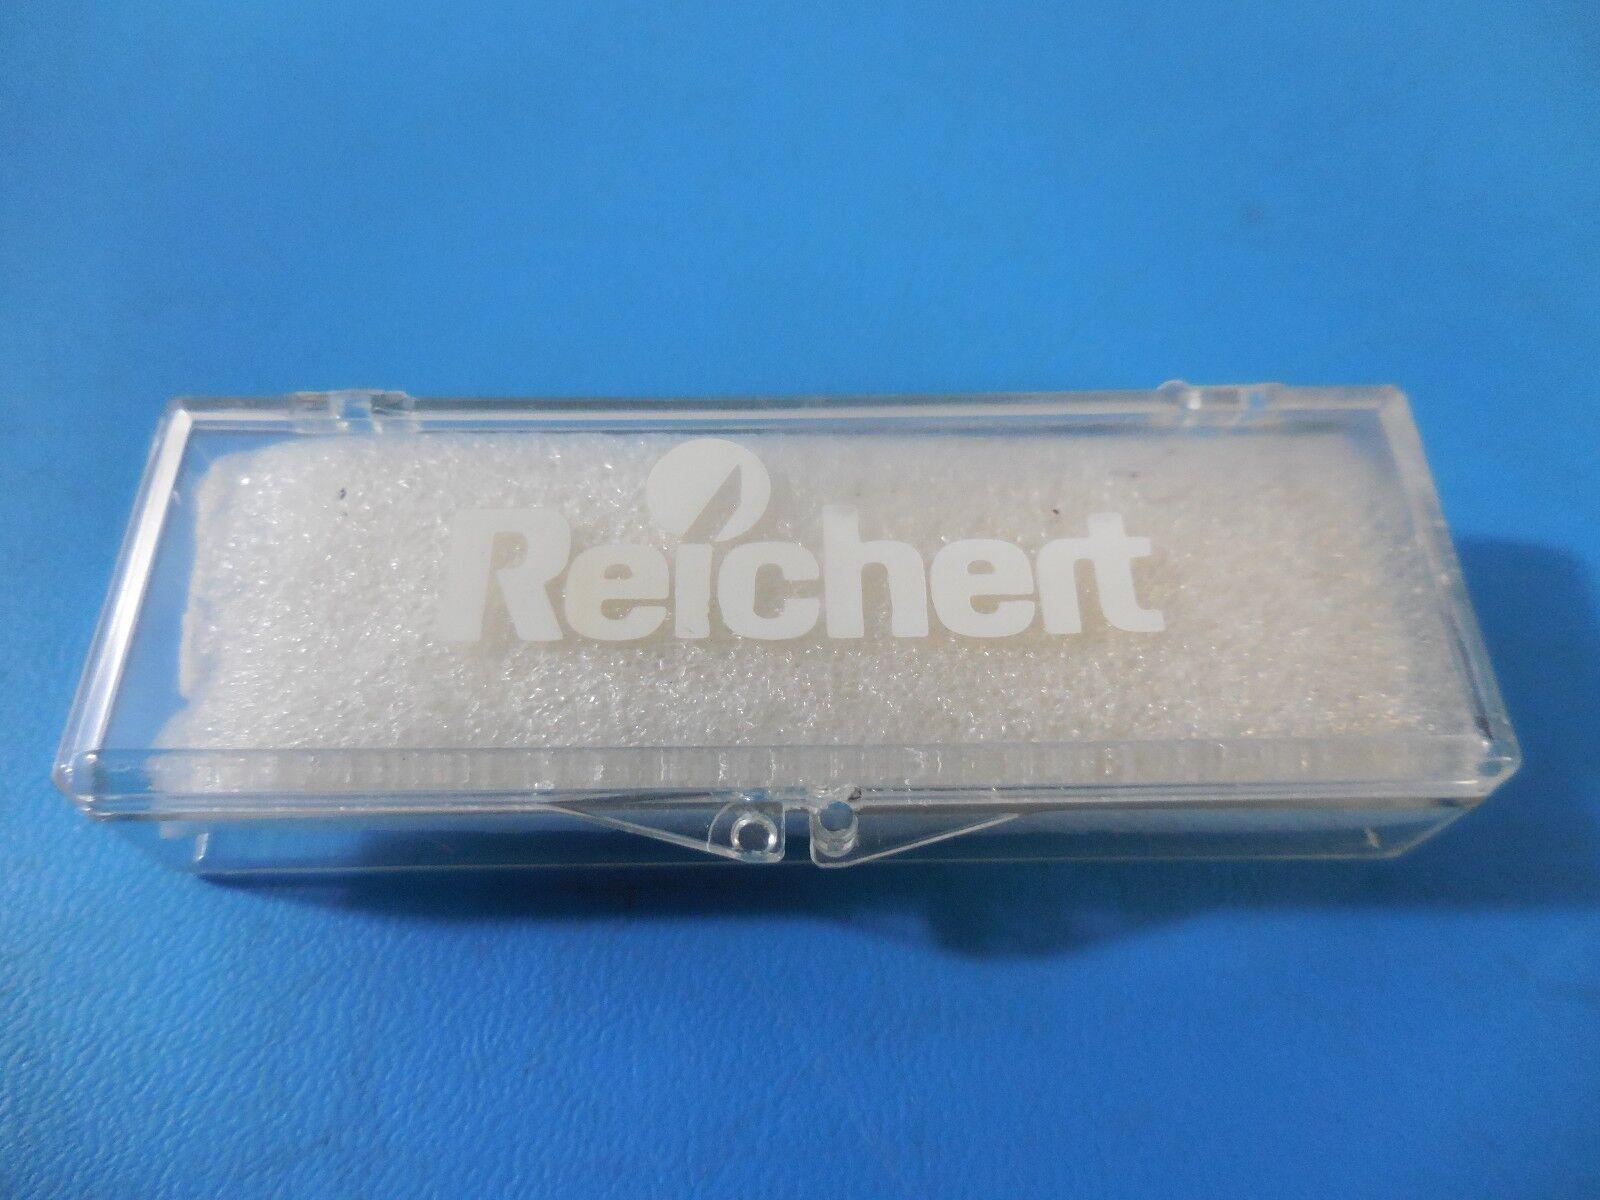 Reichert Cat:1400 Refractometer Objective Micrometer Glass Slide